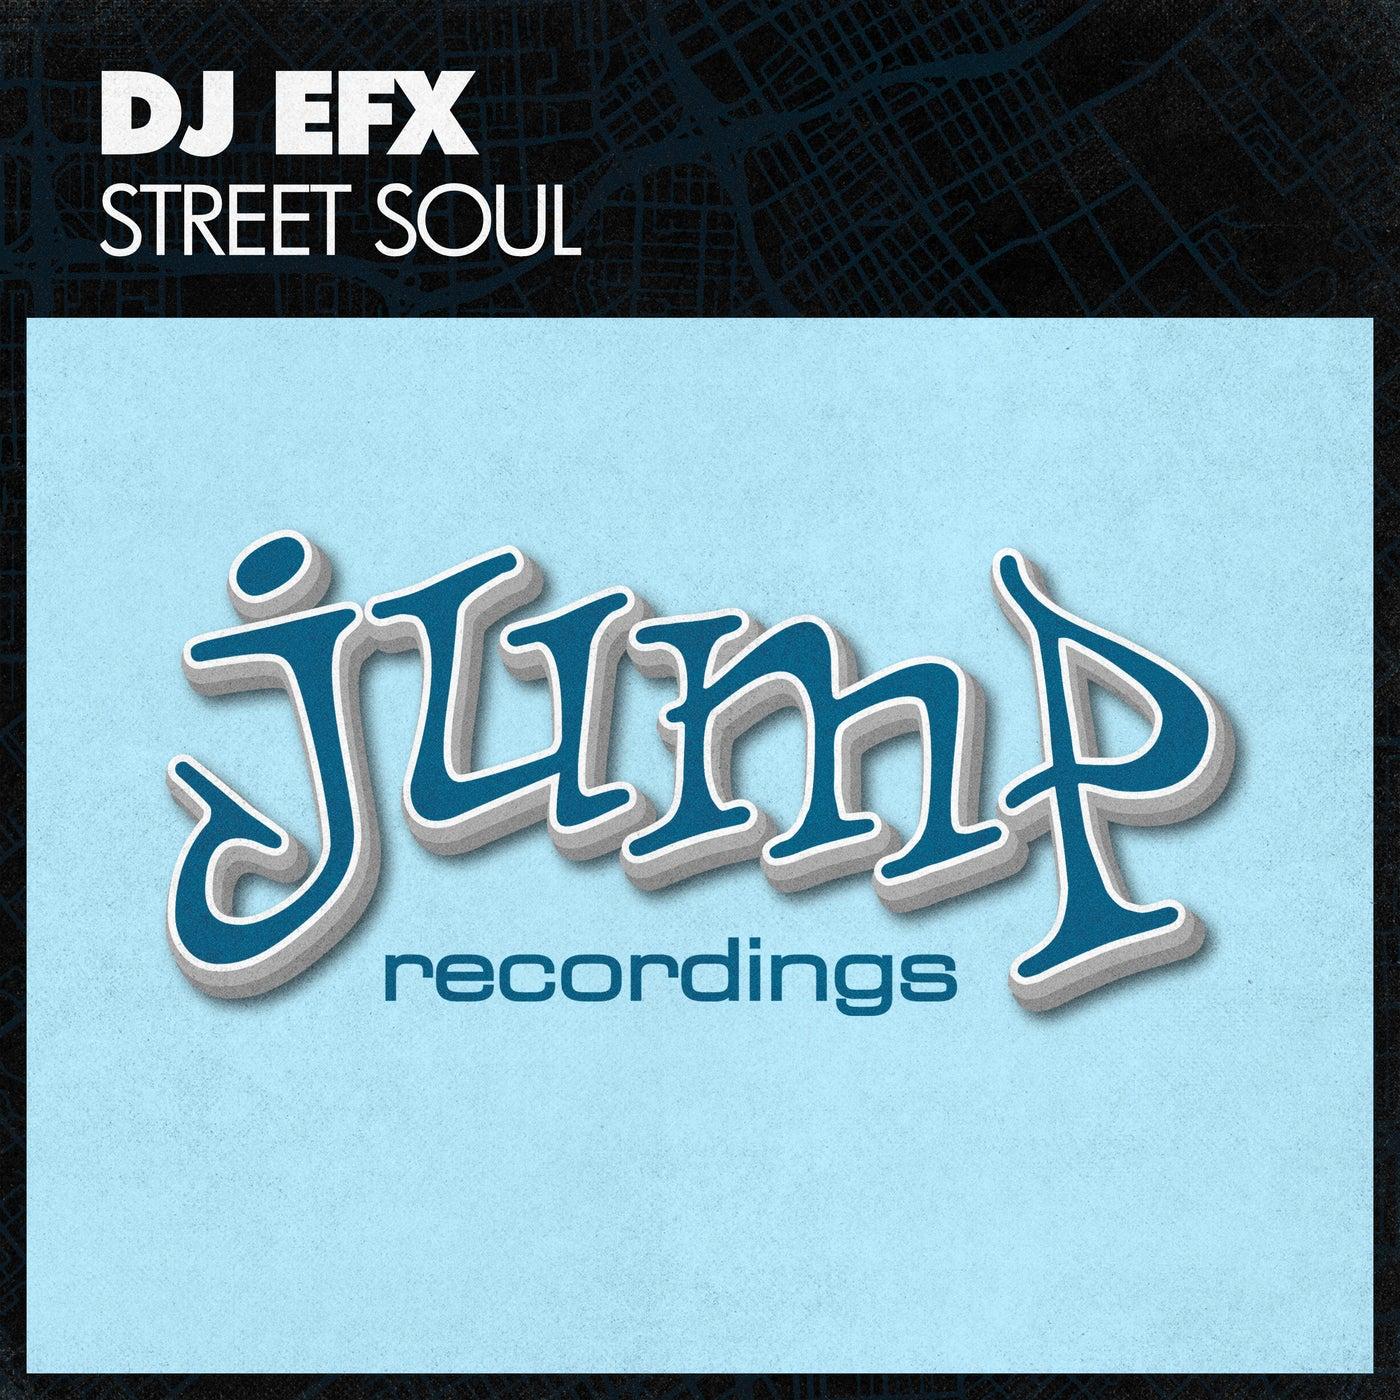 Street Corner (Original Mix)